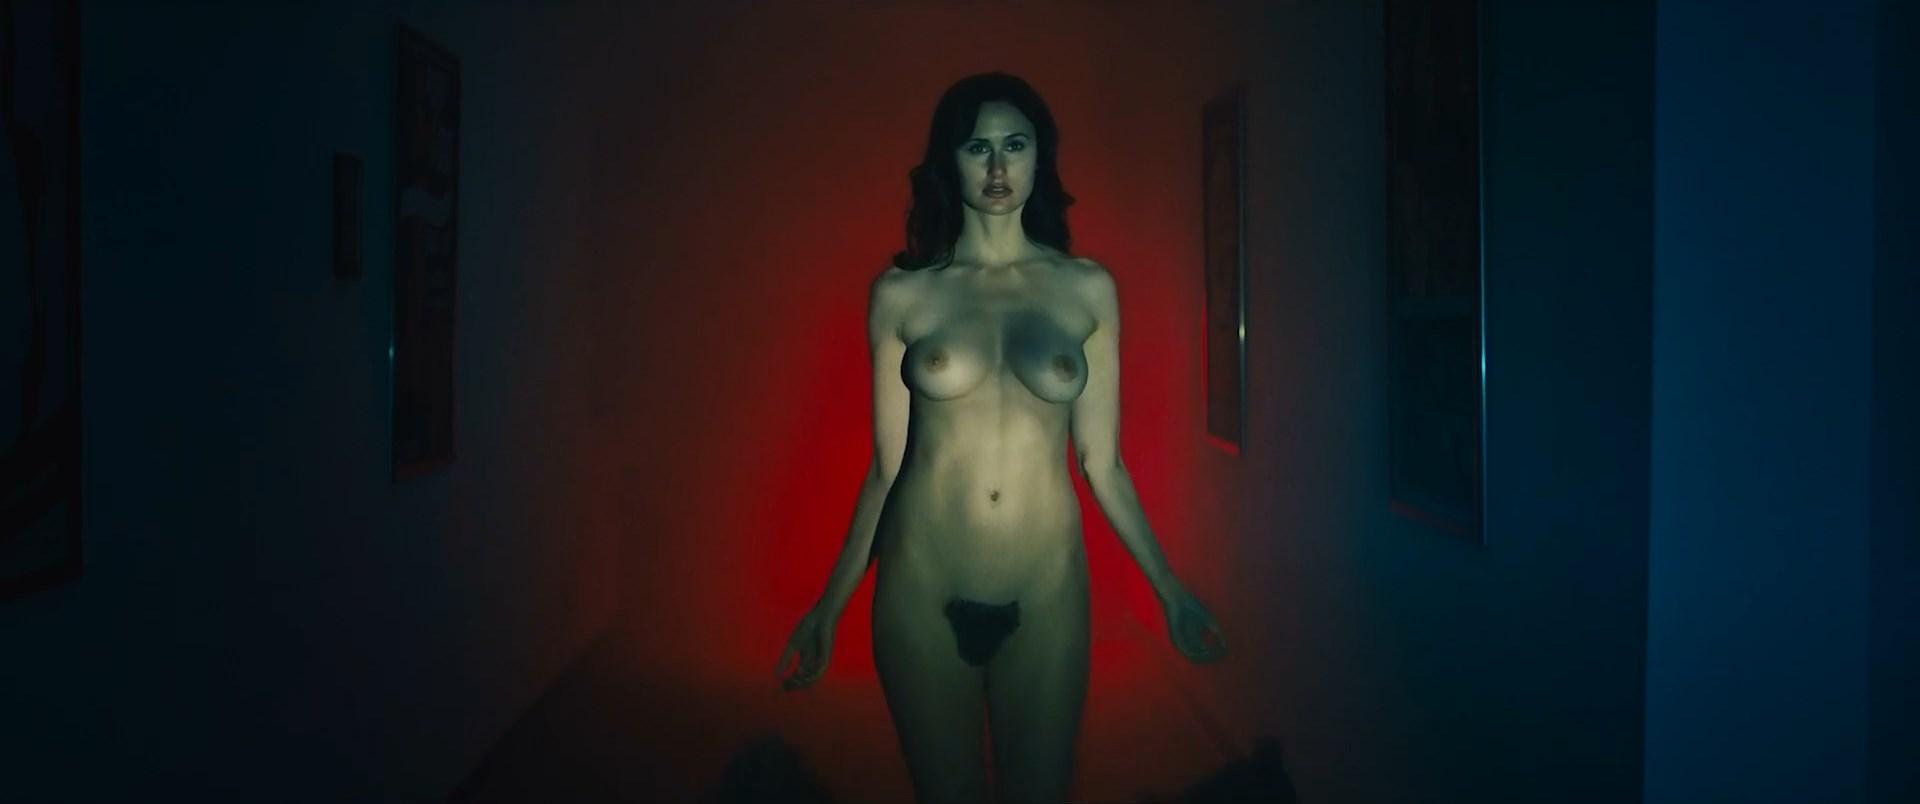 Katelyn Pearce  nackt